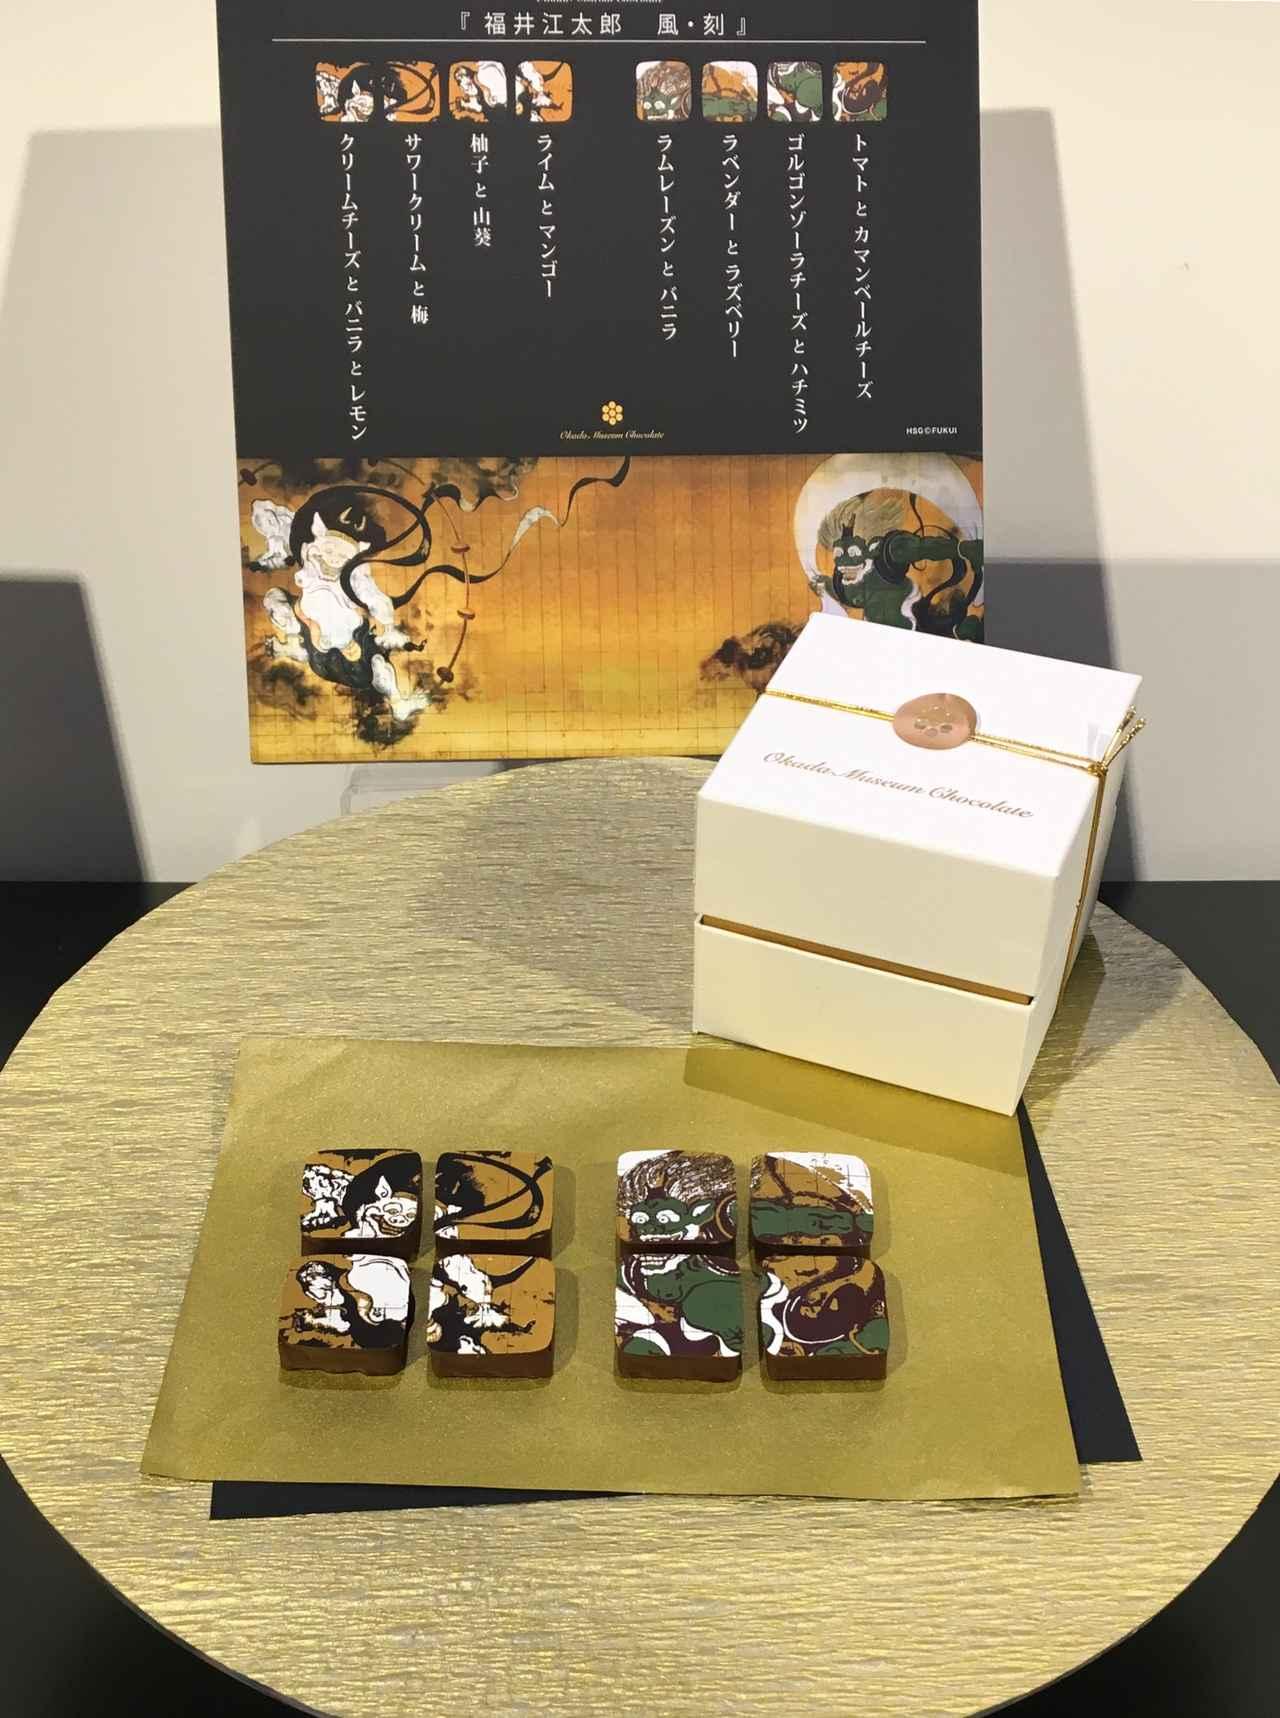 画像: 「Okada Museum Chocolate 『福井江太郎 風・刻』」